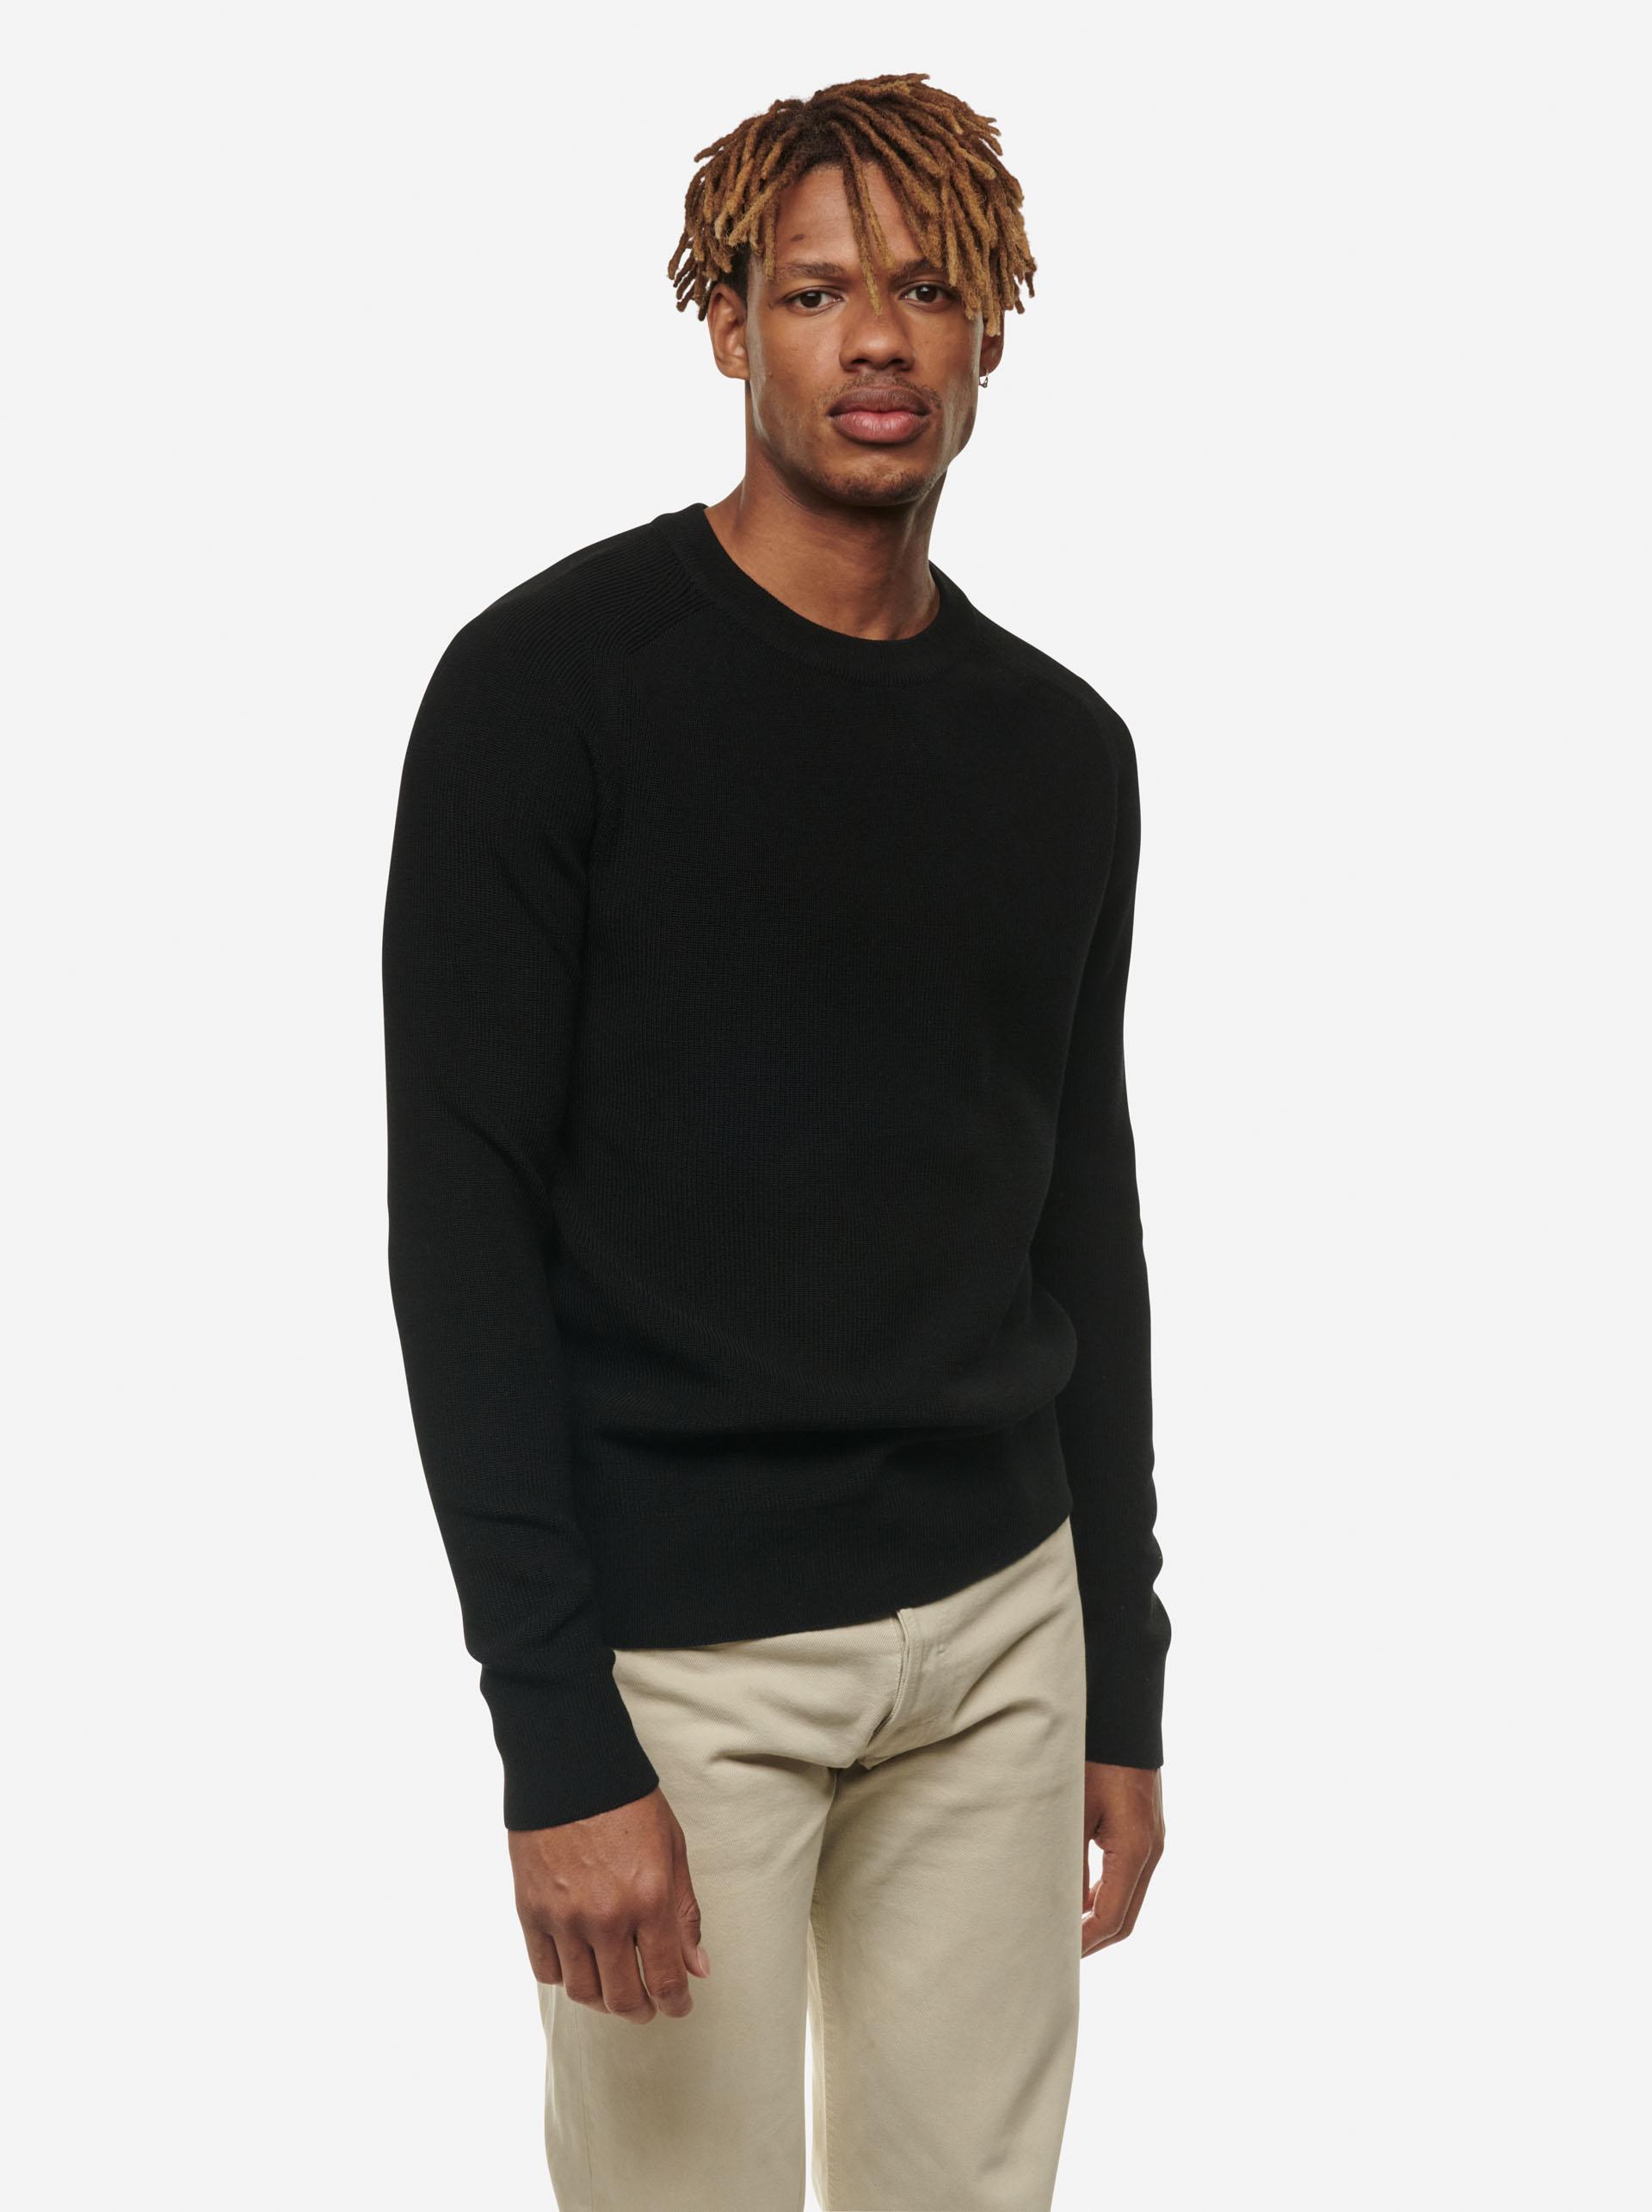 Teym - The Merino Sweater - Men - Black - 6